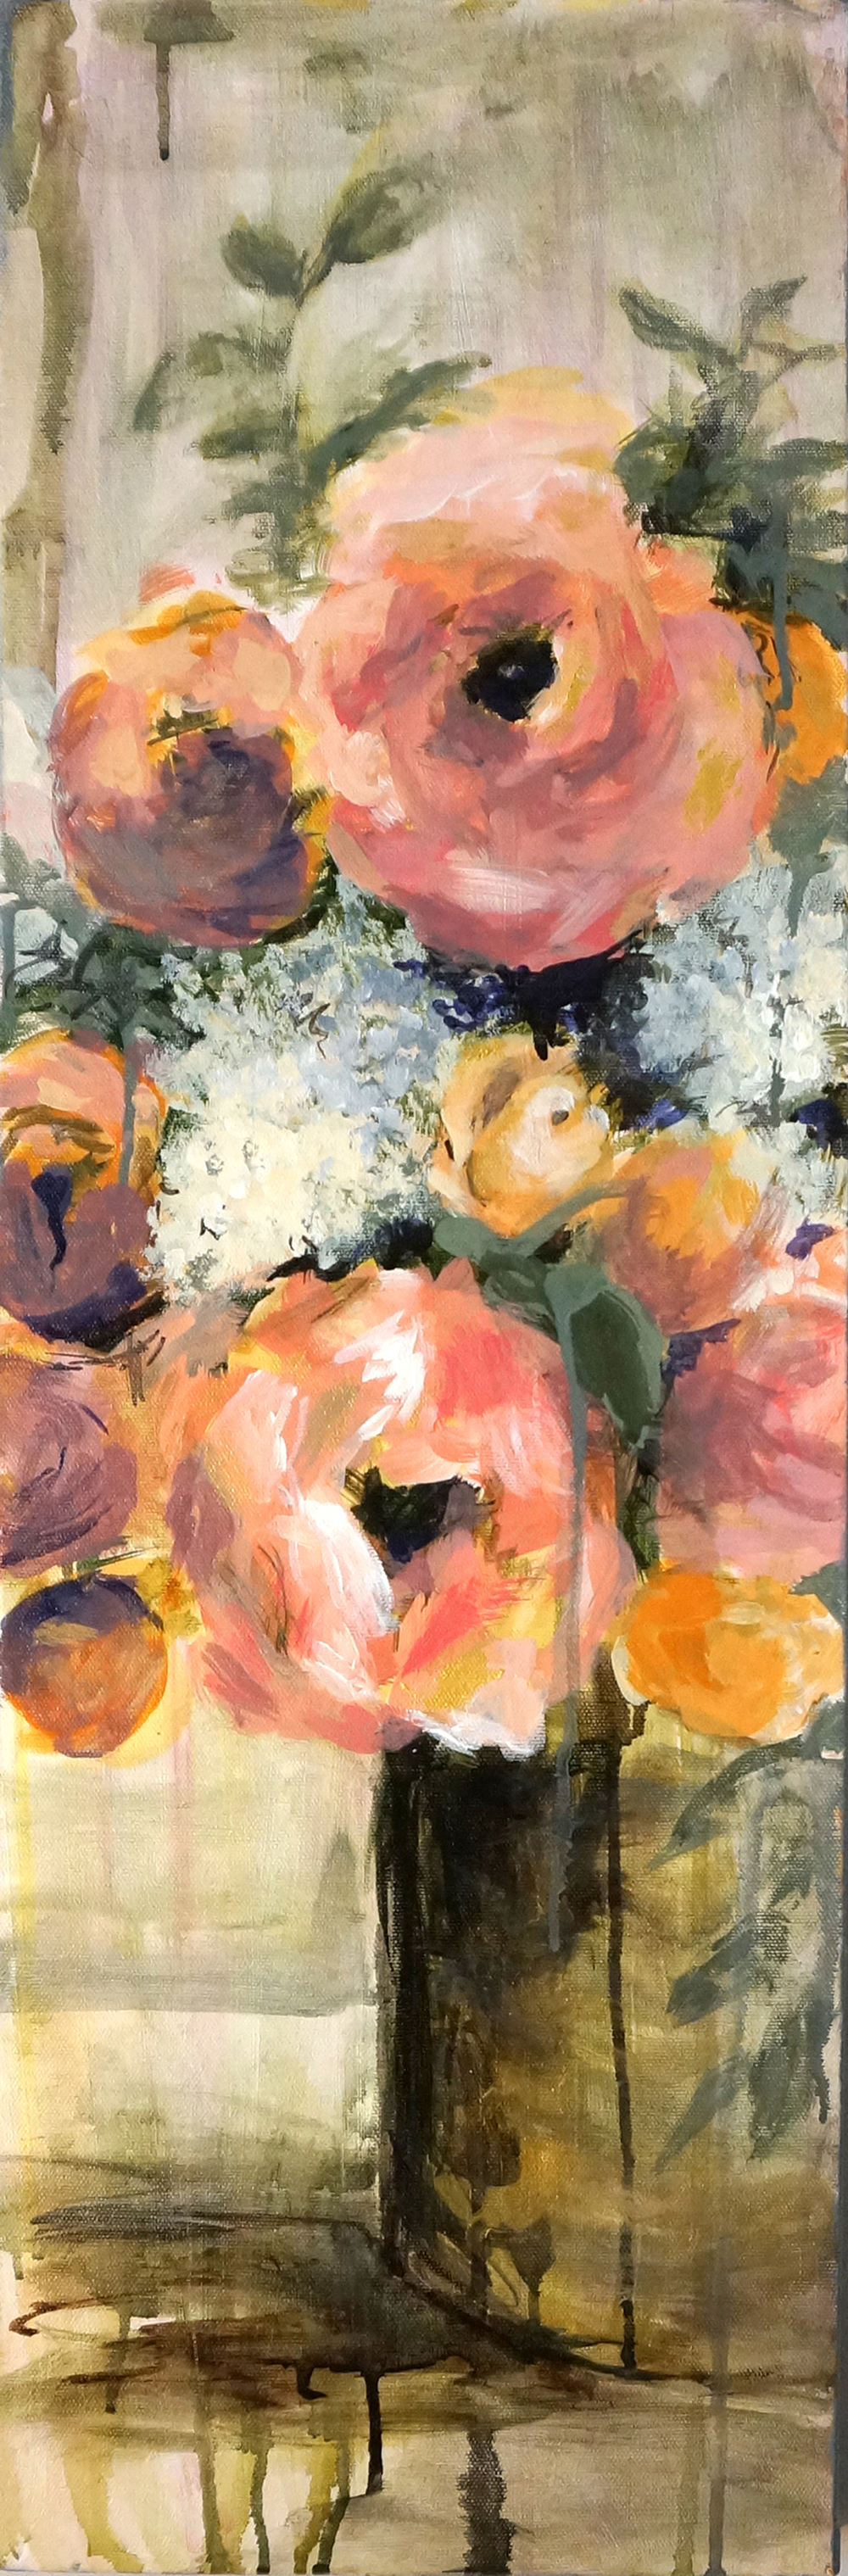 F - Peachy_ Flowers_ Kaitlin Merchant Davison Art - 1500.jpg